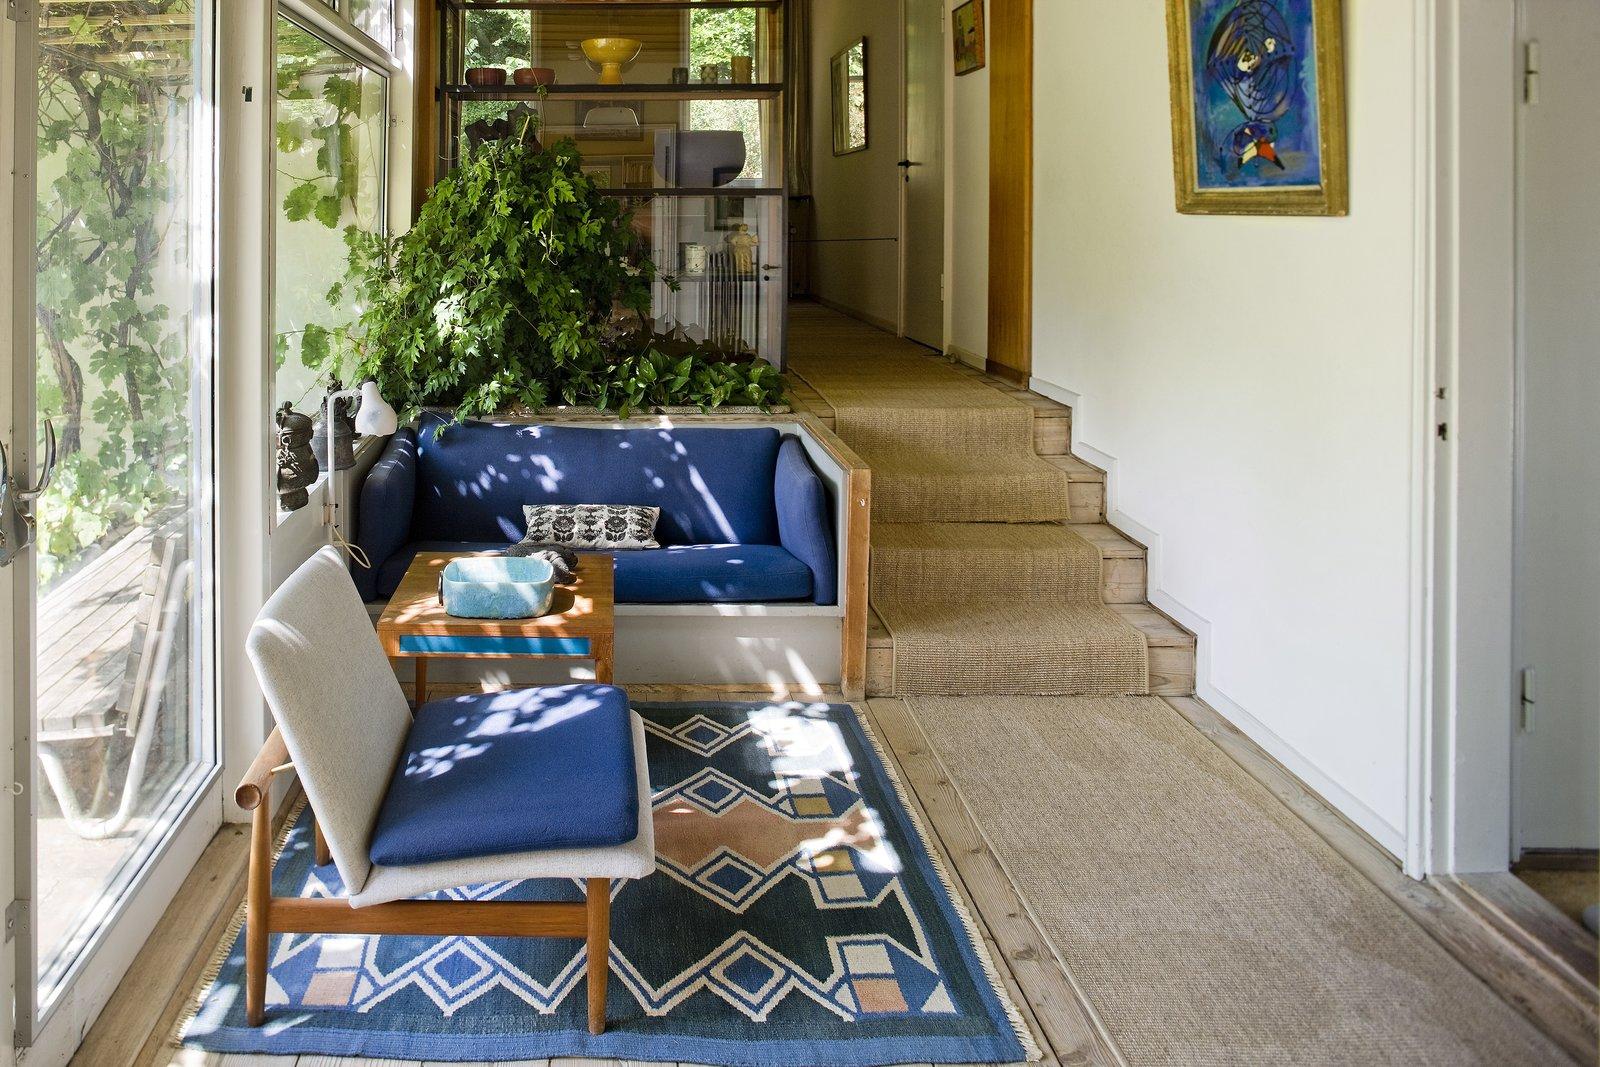 #seatingdesign #seating #blue #color #design #rug #chair #livingroom #interior #indoor #inside #stairs #Danish #FinnJuhl